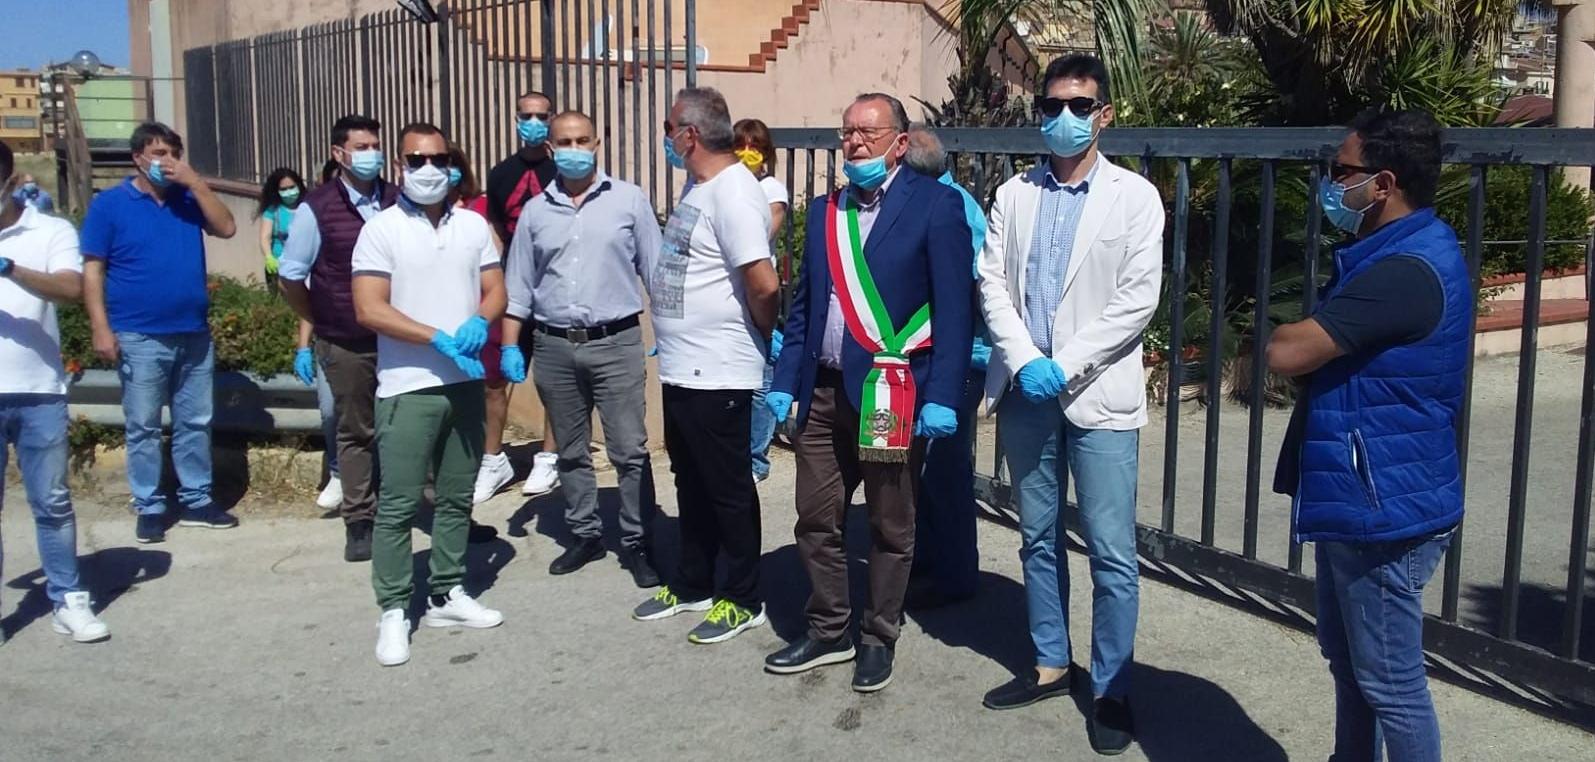 Siculiana, fuggono migranti in quarantena